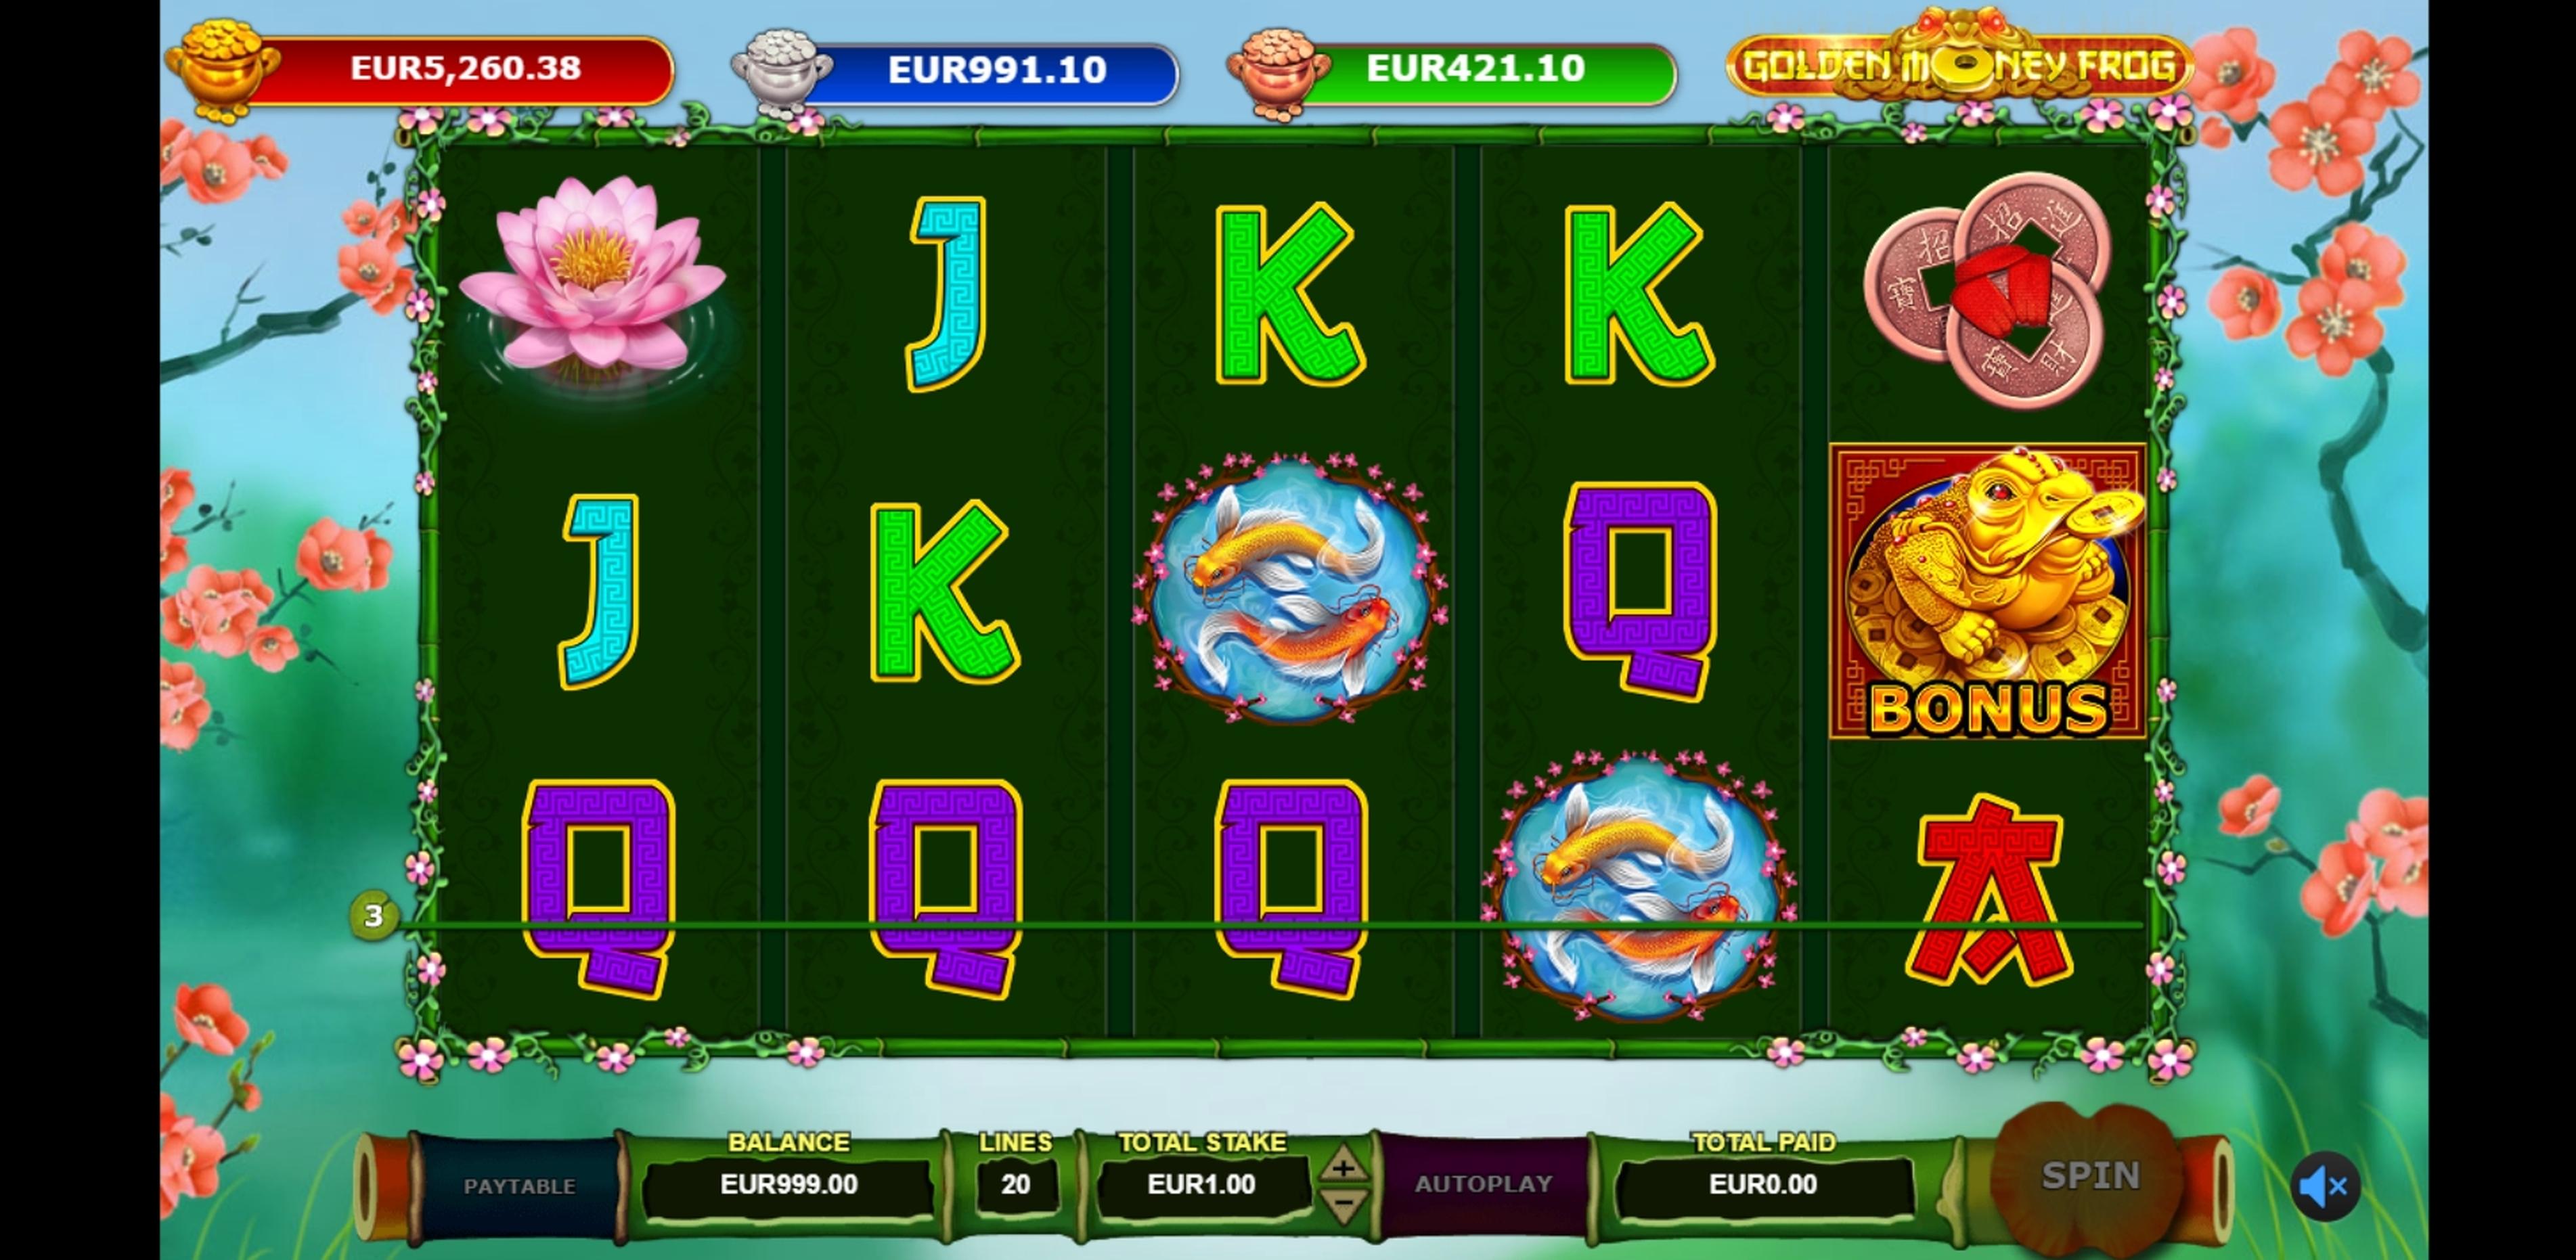 Crypto sports betting